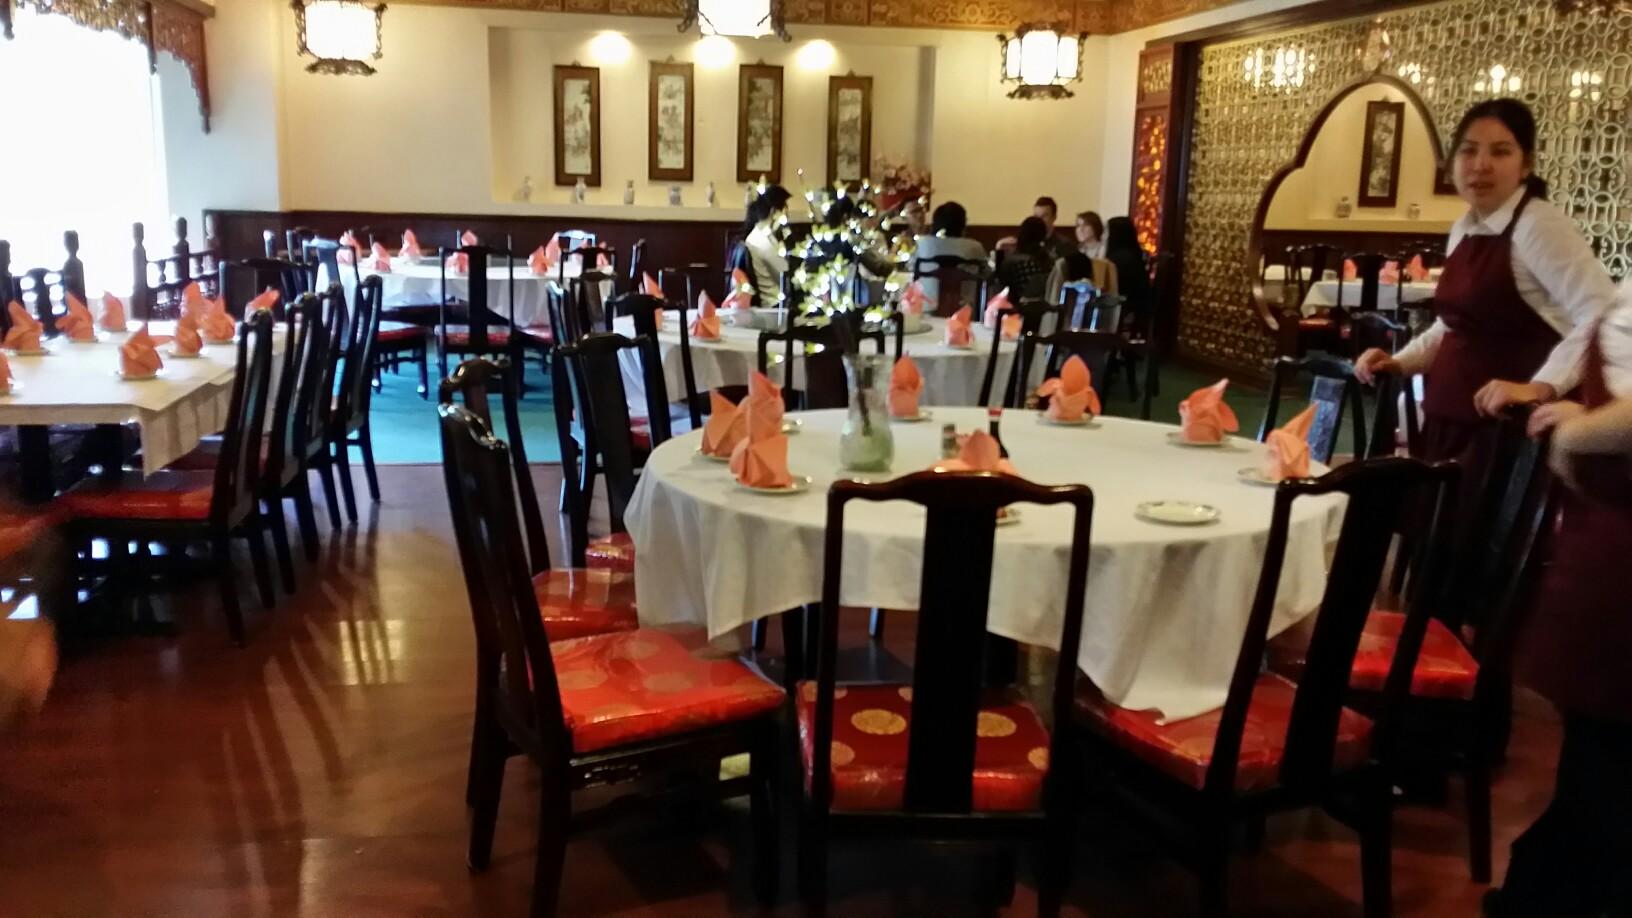 Grand Oriental Chinese Restaurant 4800 Fields Ertel Rd Cincinnati Oh 45249 Yp